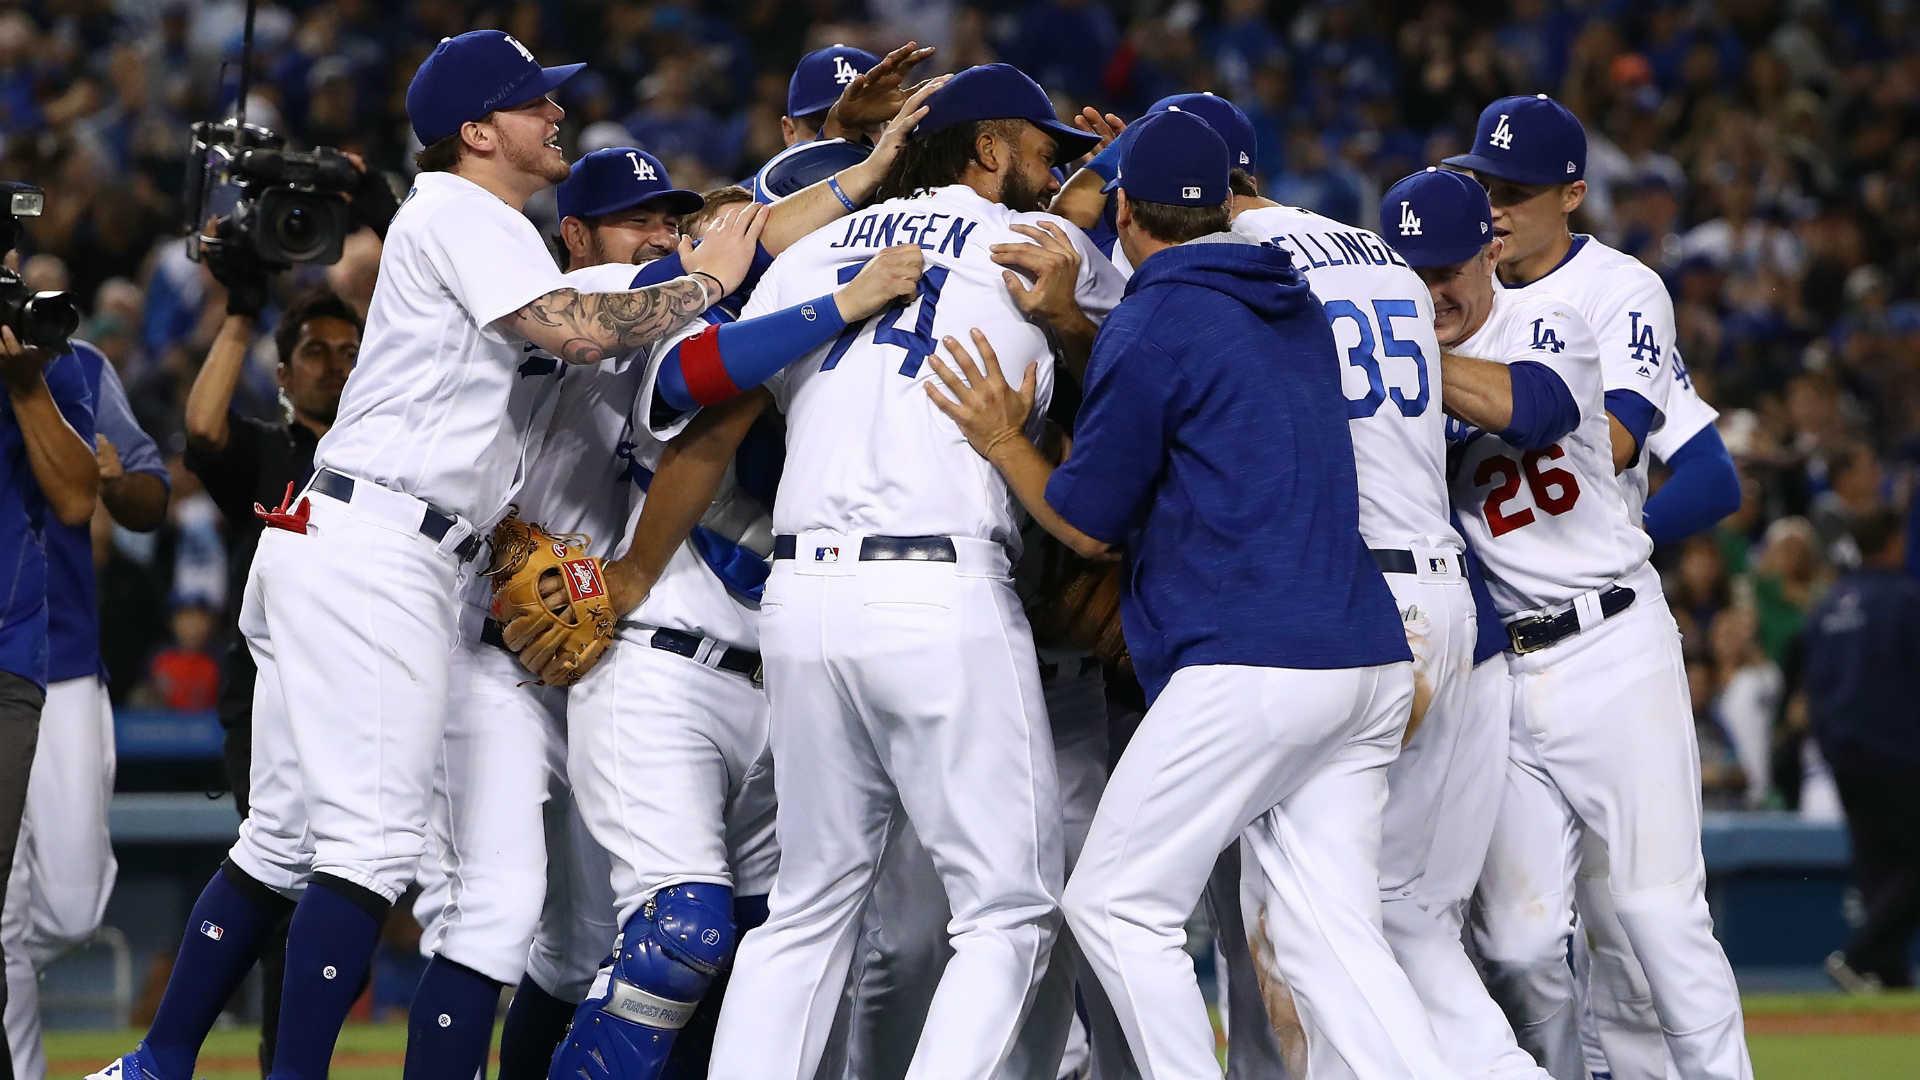 Dodgers-celebrate_1h2jv8zrjf6zo15akozjy9jksk